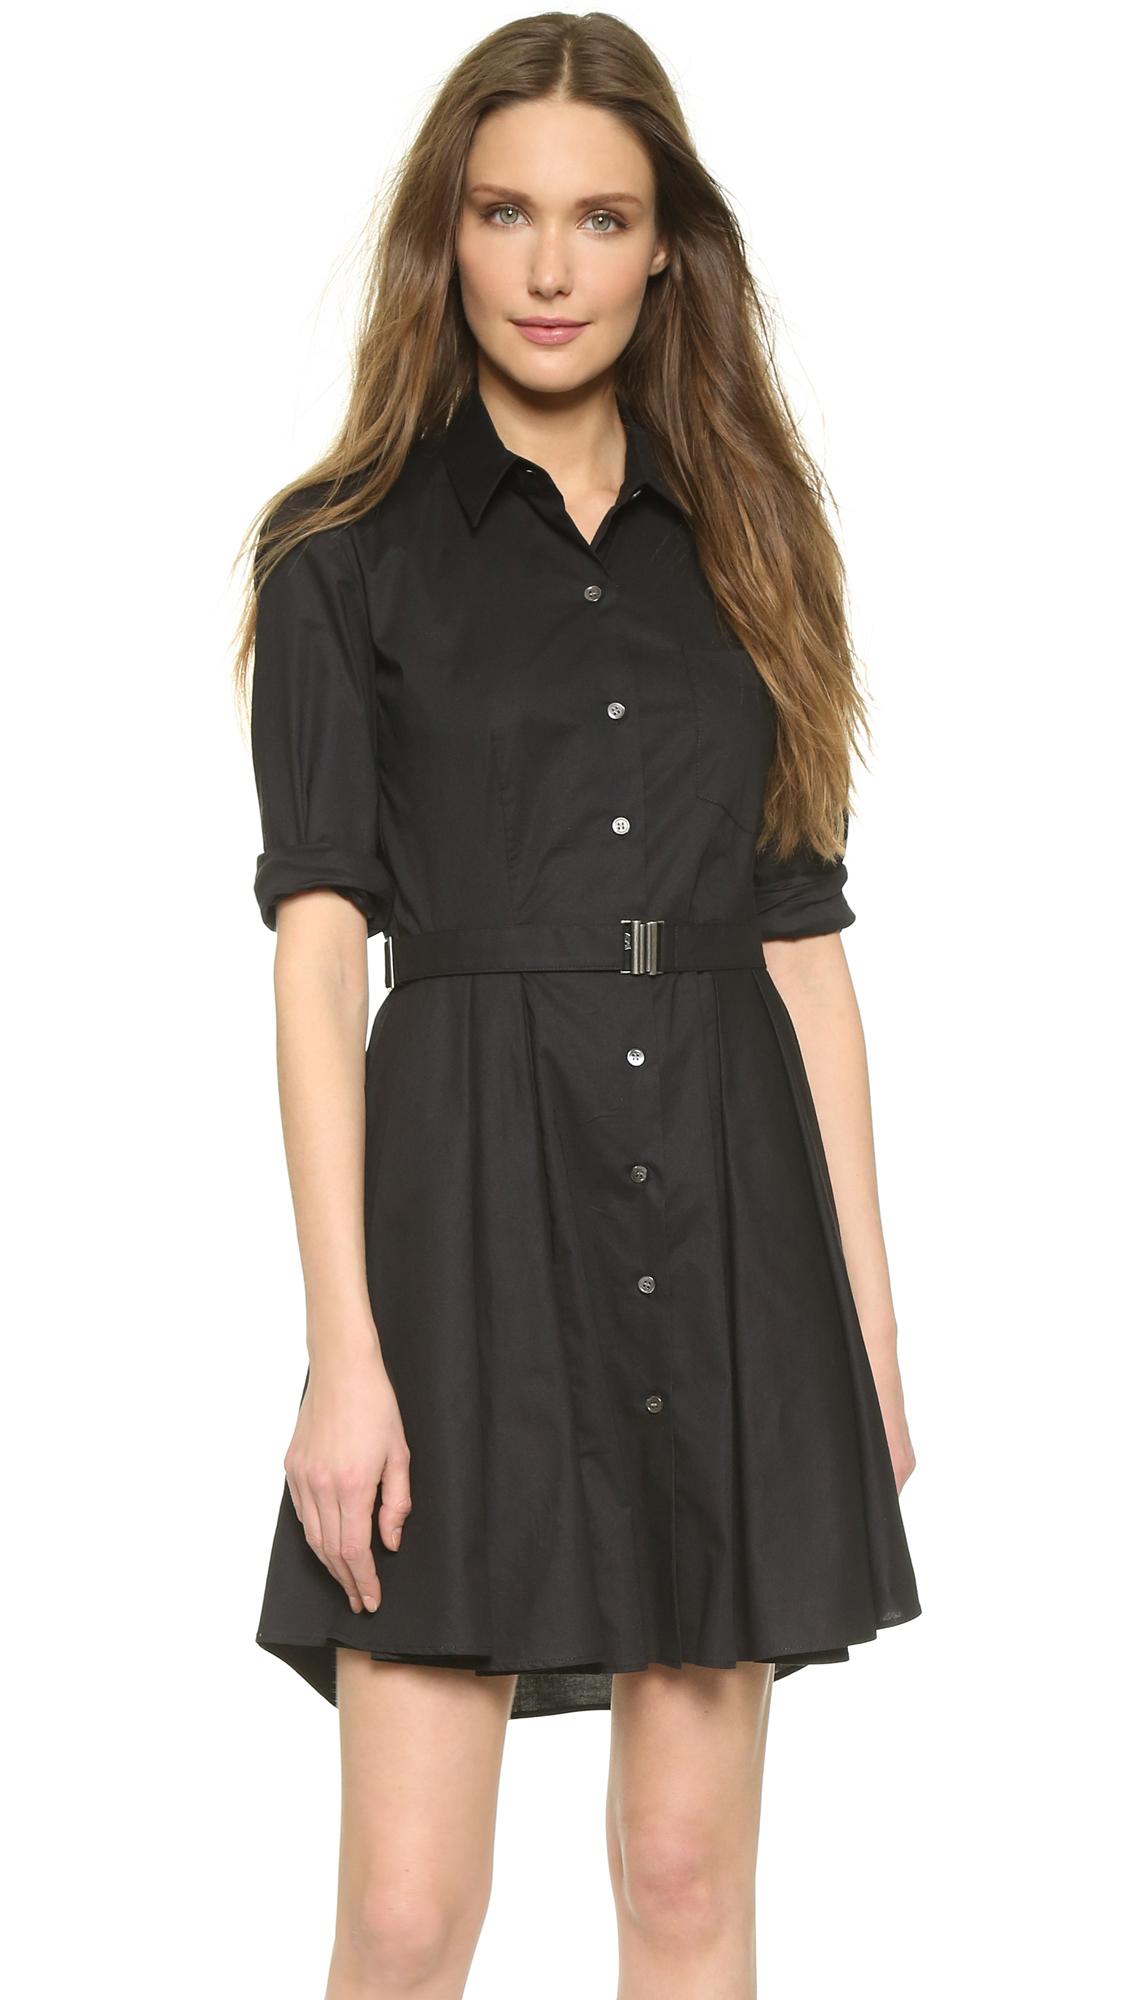 Theory black and white shirt dress